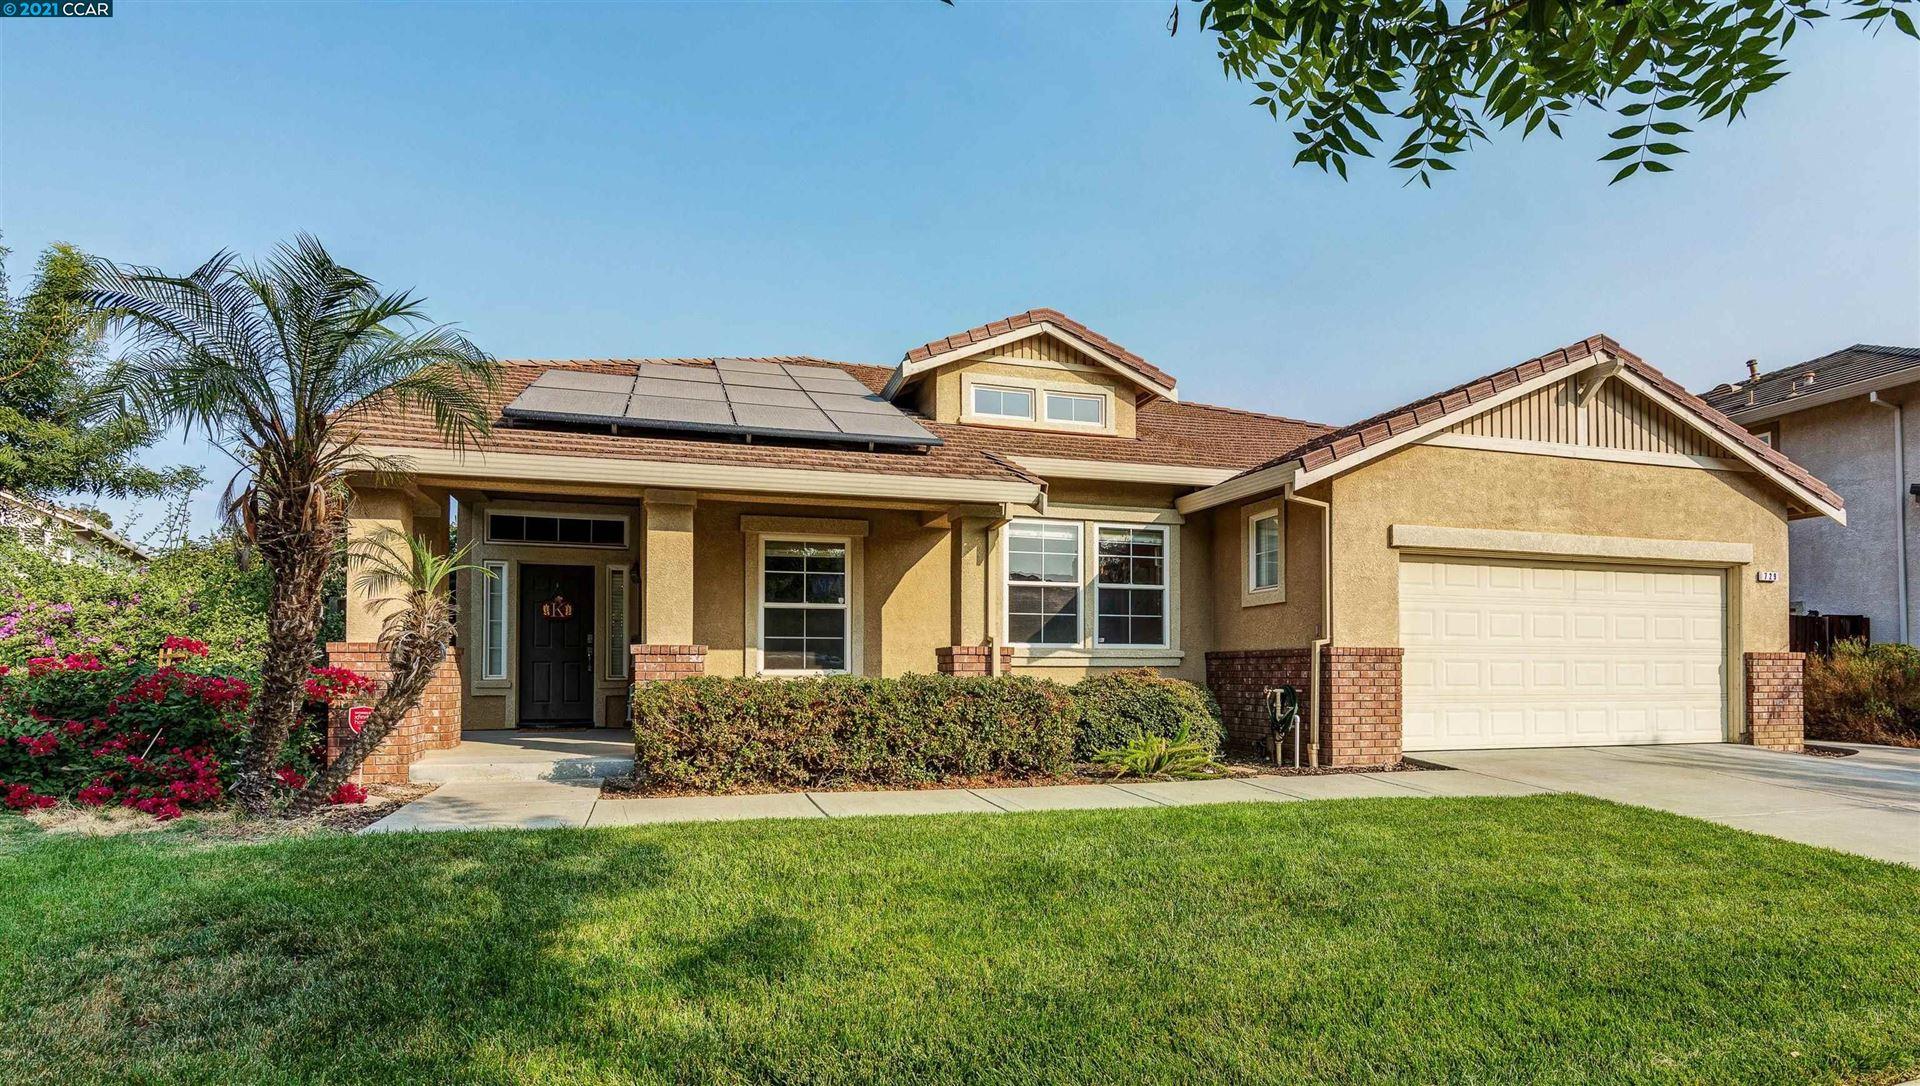 Photo of 729 Craig Ct, Brentwood, CA 94513 (MLS # 40970042)